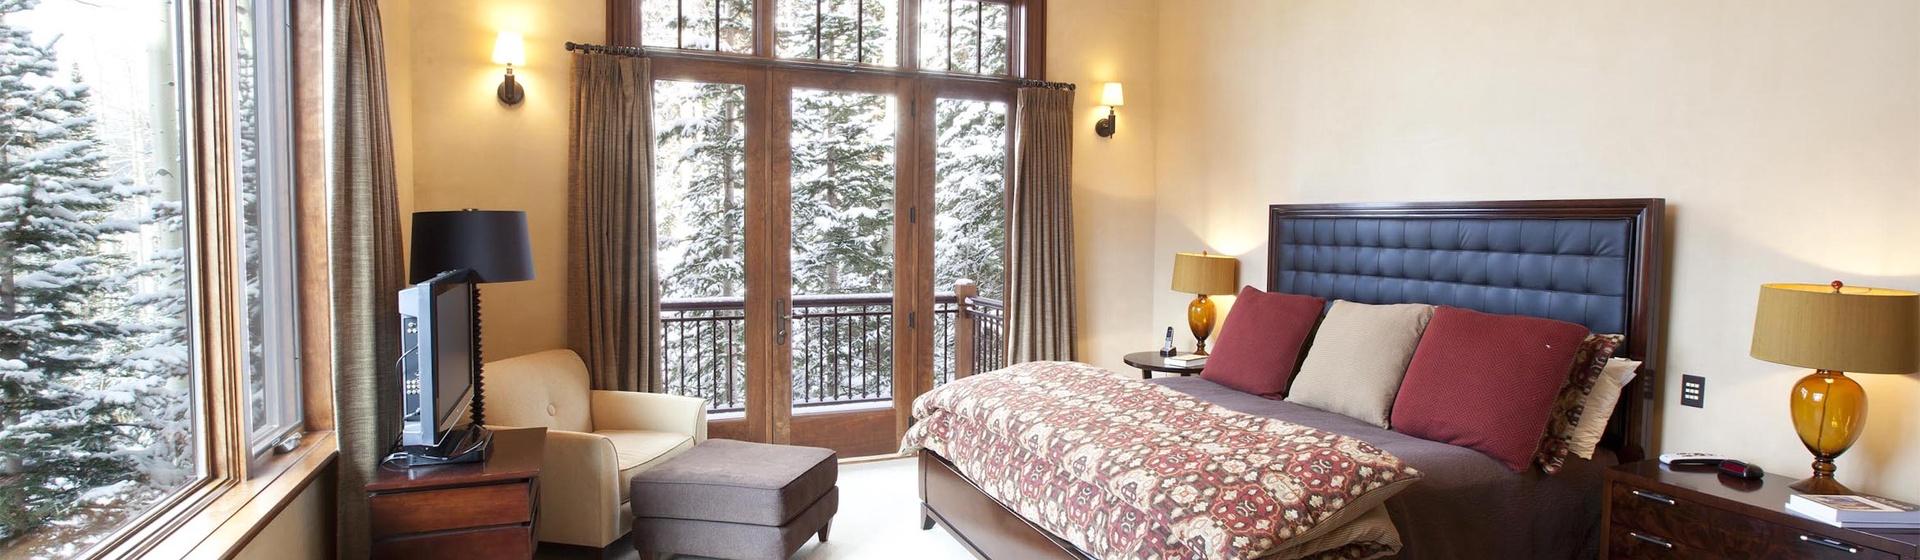 5.11-mountain-village-hood-park-manor-master-bedroom-c-track.jpg